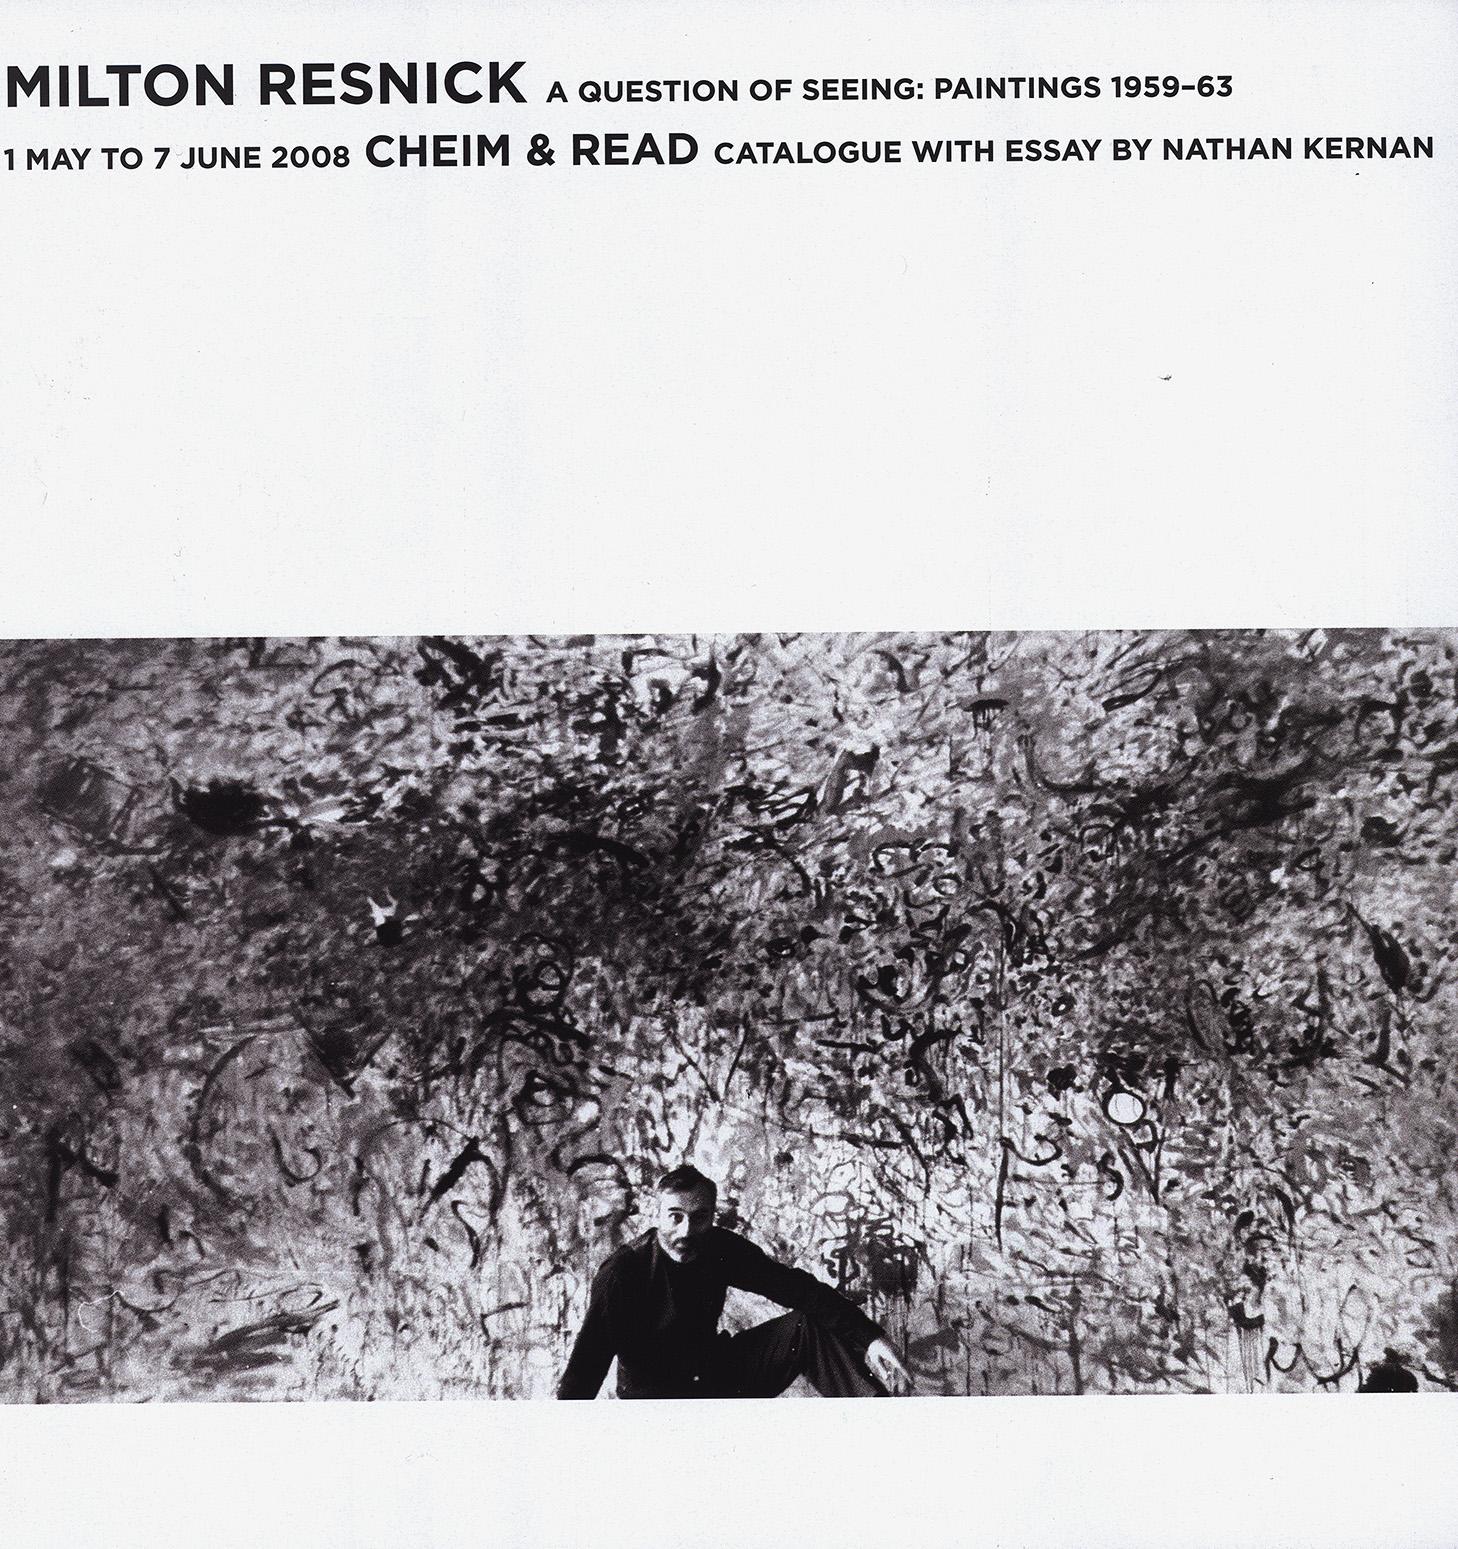 Resnick-Milton_CheimRead_2008.jpg